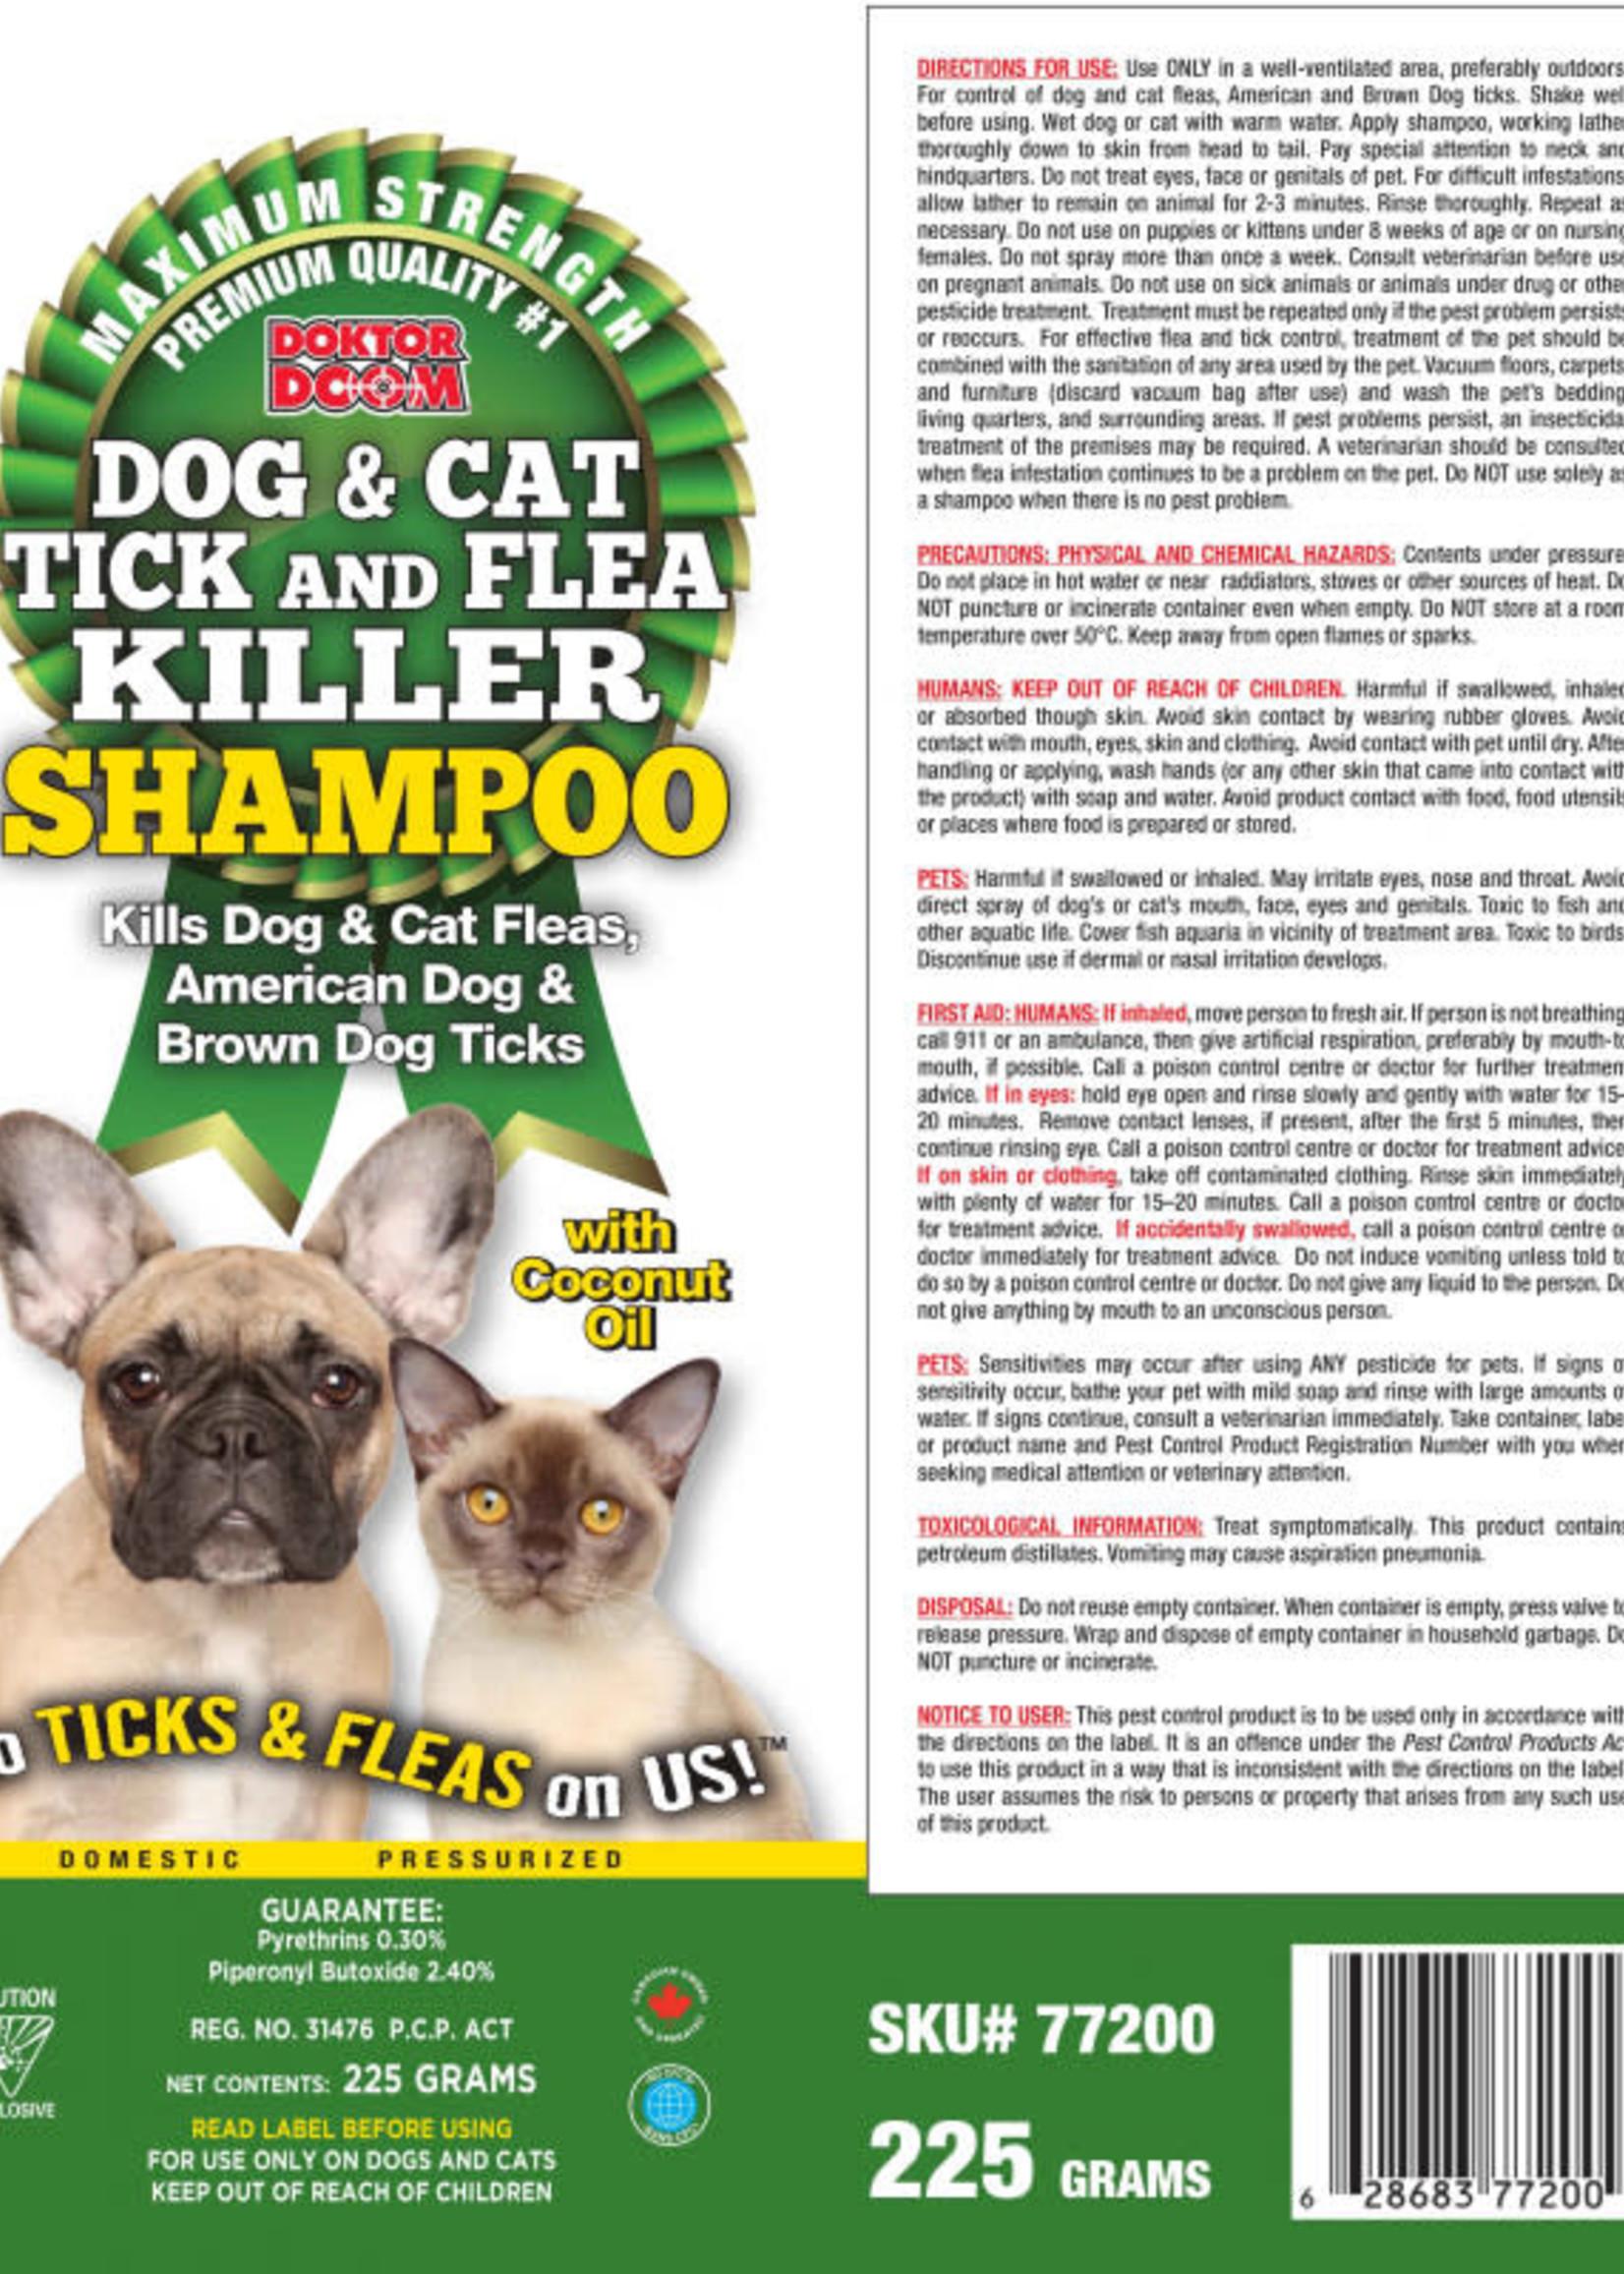 Ultrasol Dr Doom Flea & Tick Shampoo